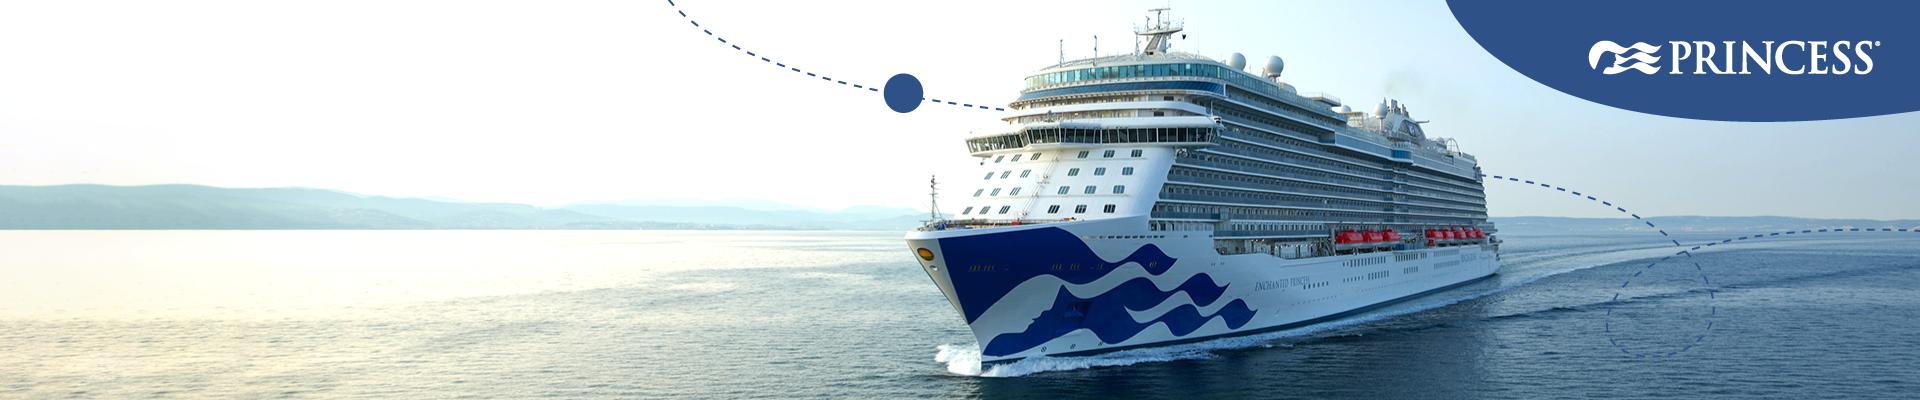 ¡Enchanted Princess se une oficialmente a la flota de Princess Cruises!